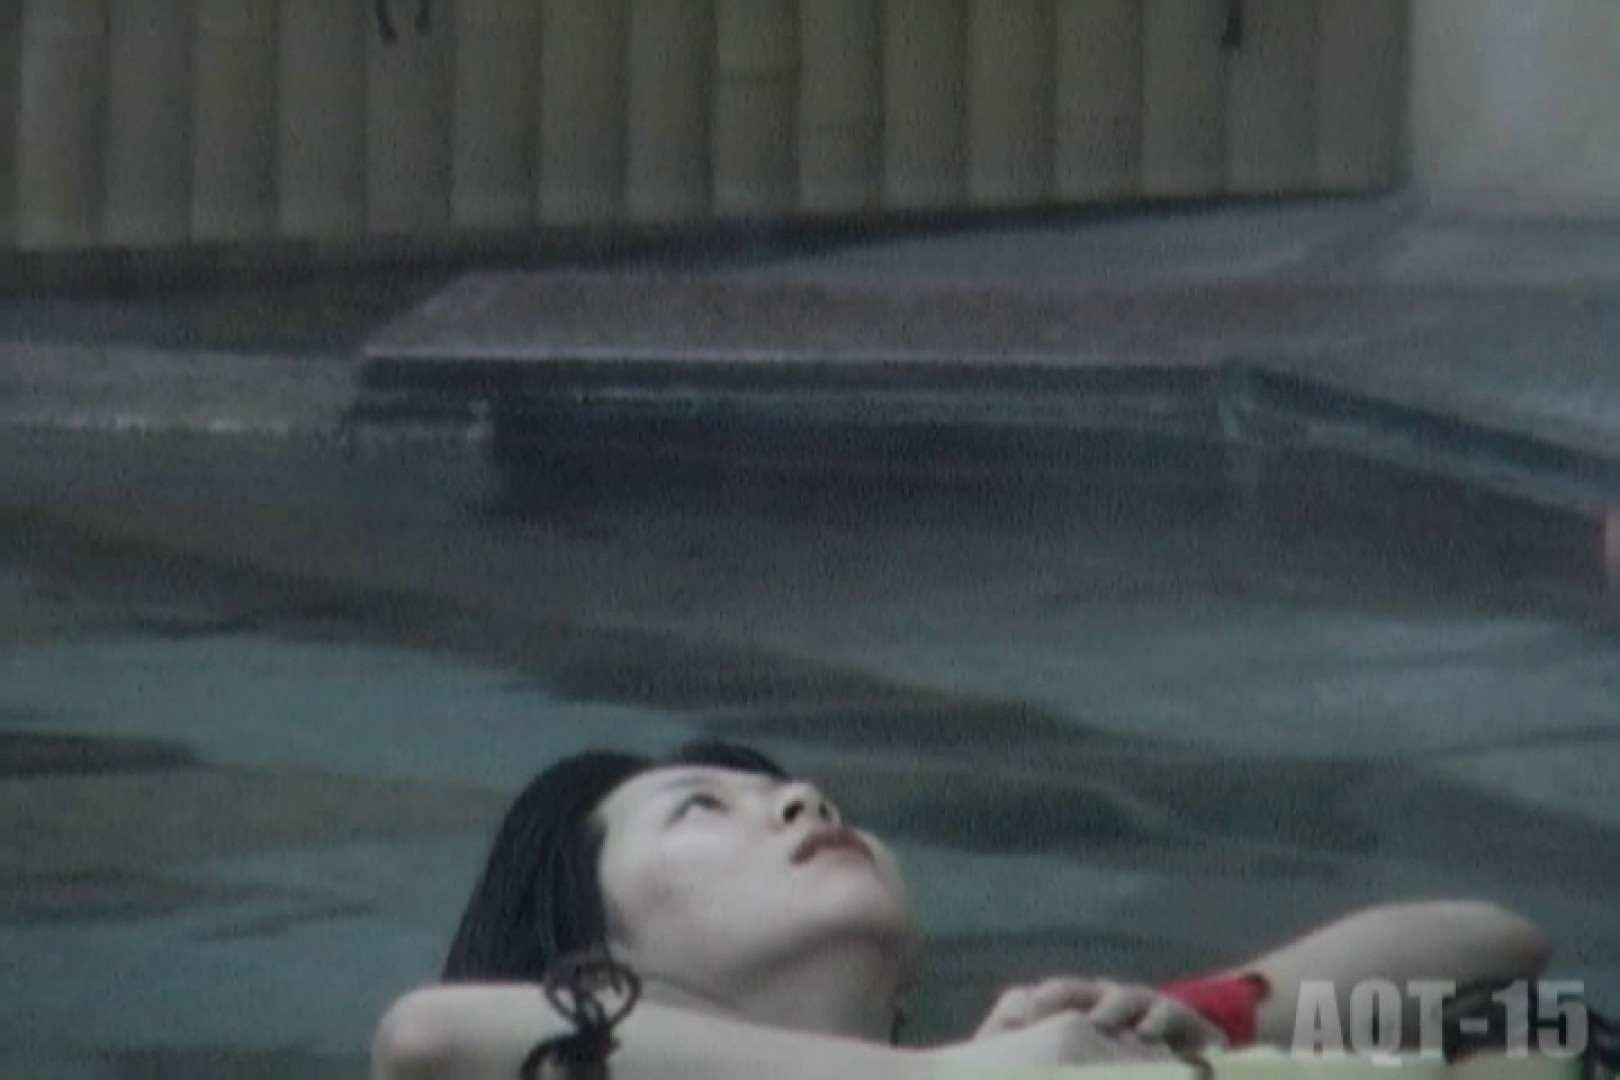 Aquaな露天風呂Vol.837 盗撮シリーズ   露天風呂編  106PIX 77